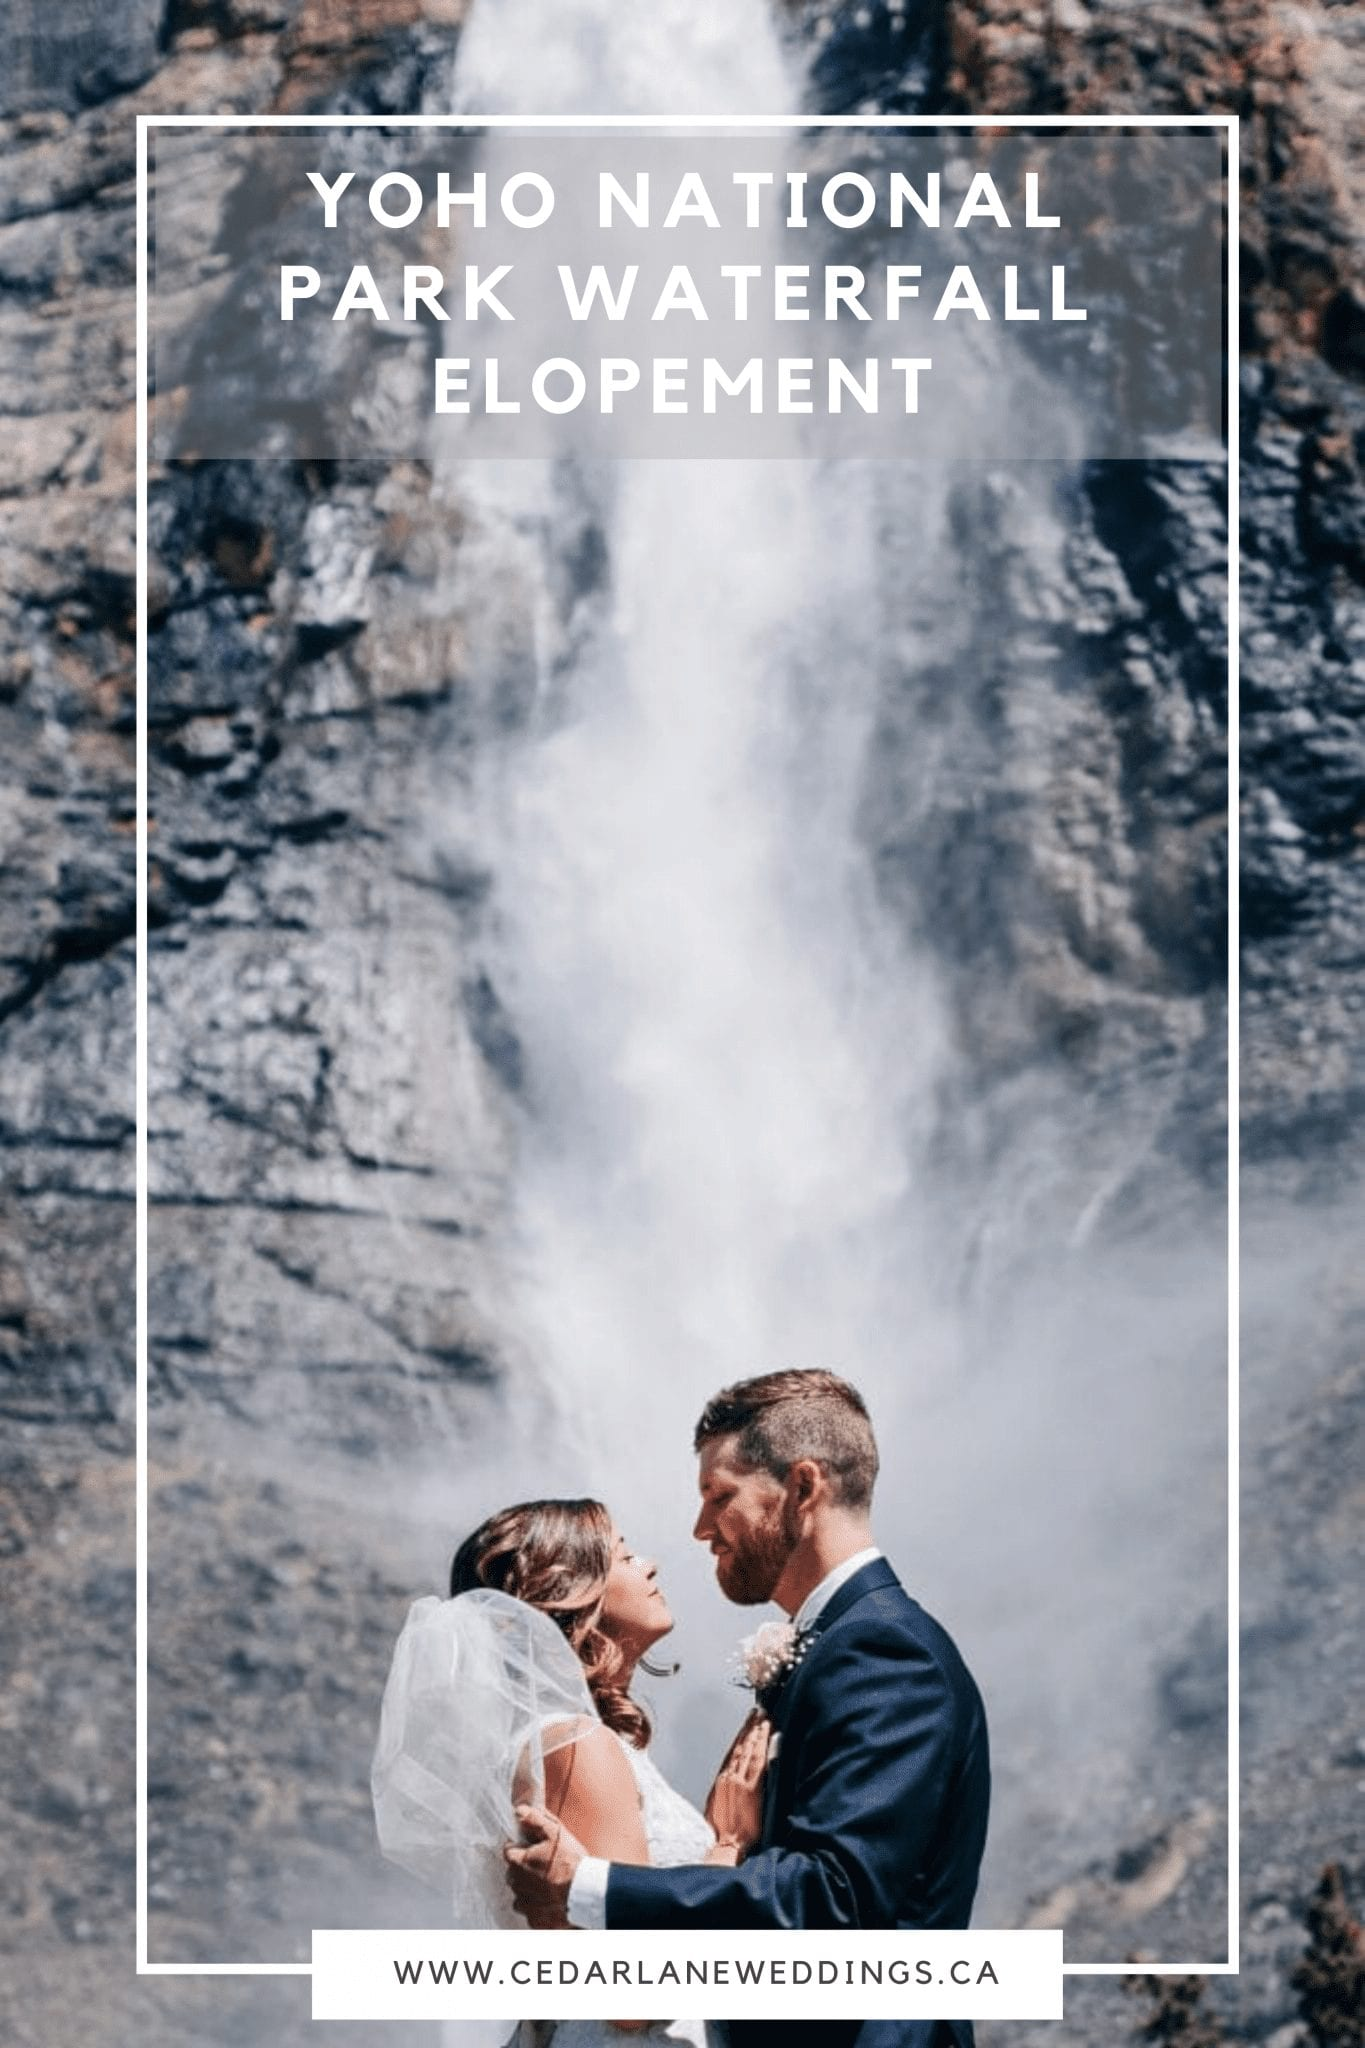 Yoho National Park Waterfall Elopement